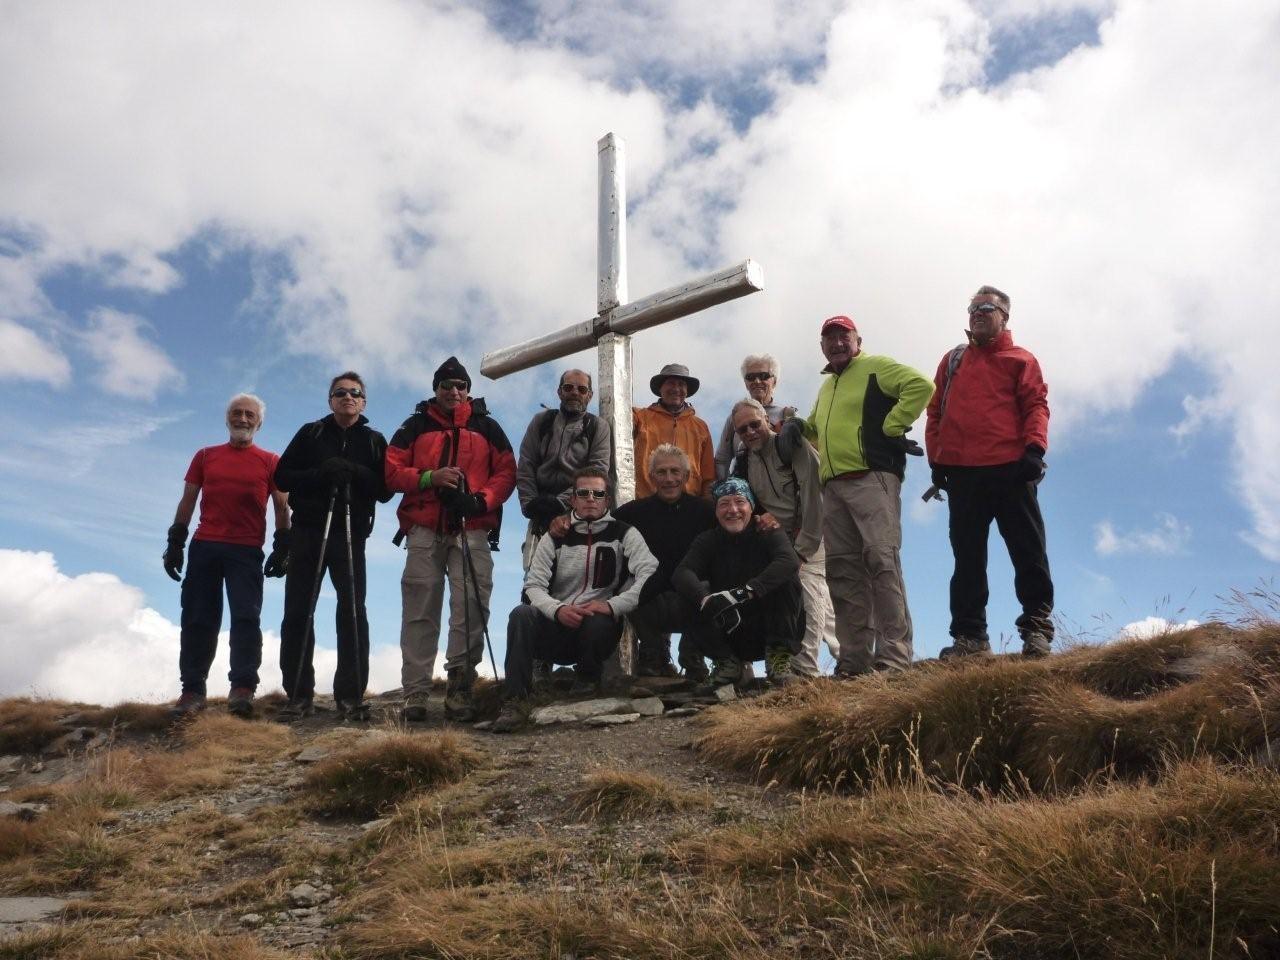 La Gardiole de l'Alp (2786 m)